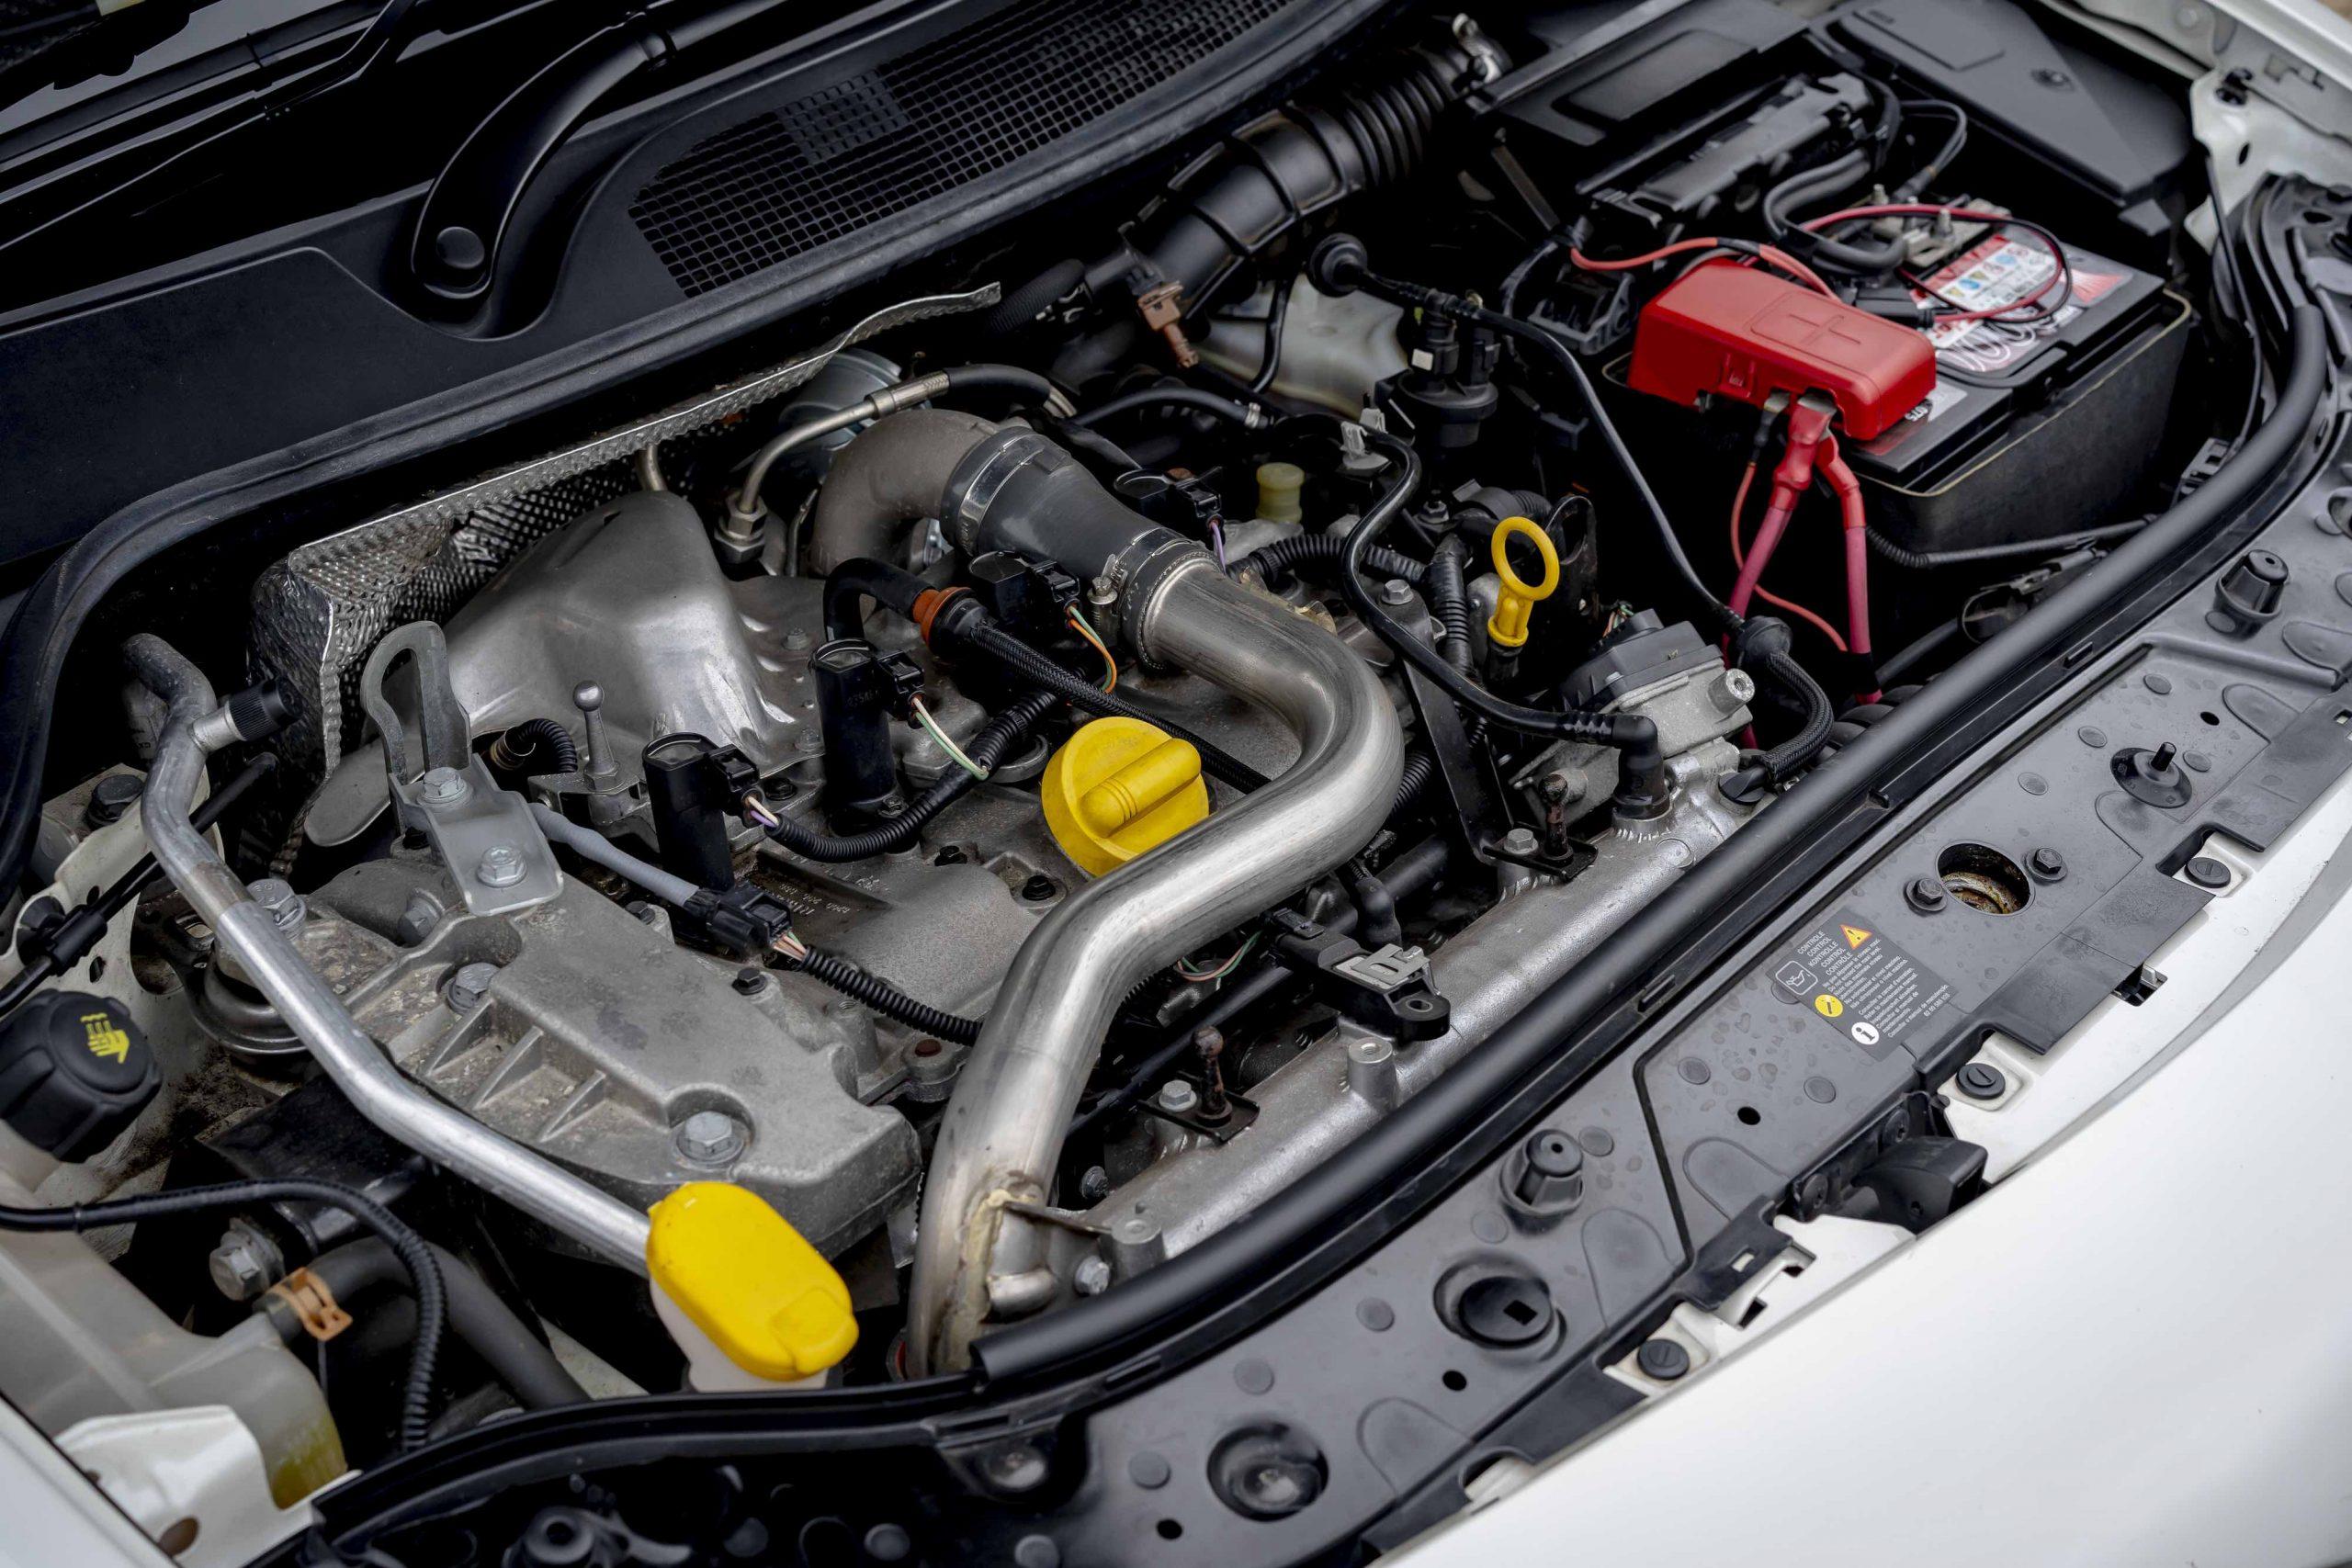 renault megane r26r engine bay detail